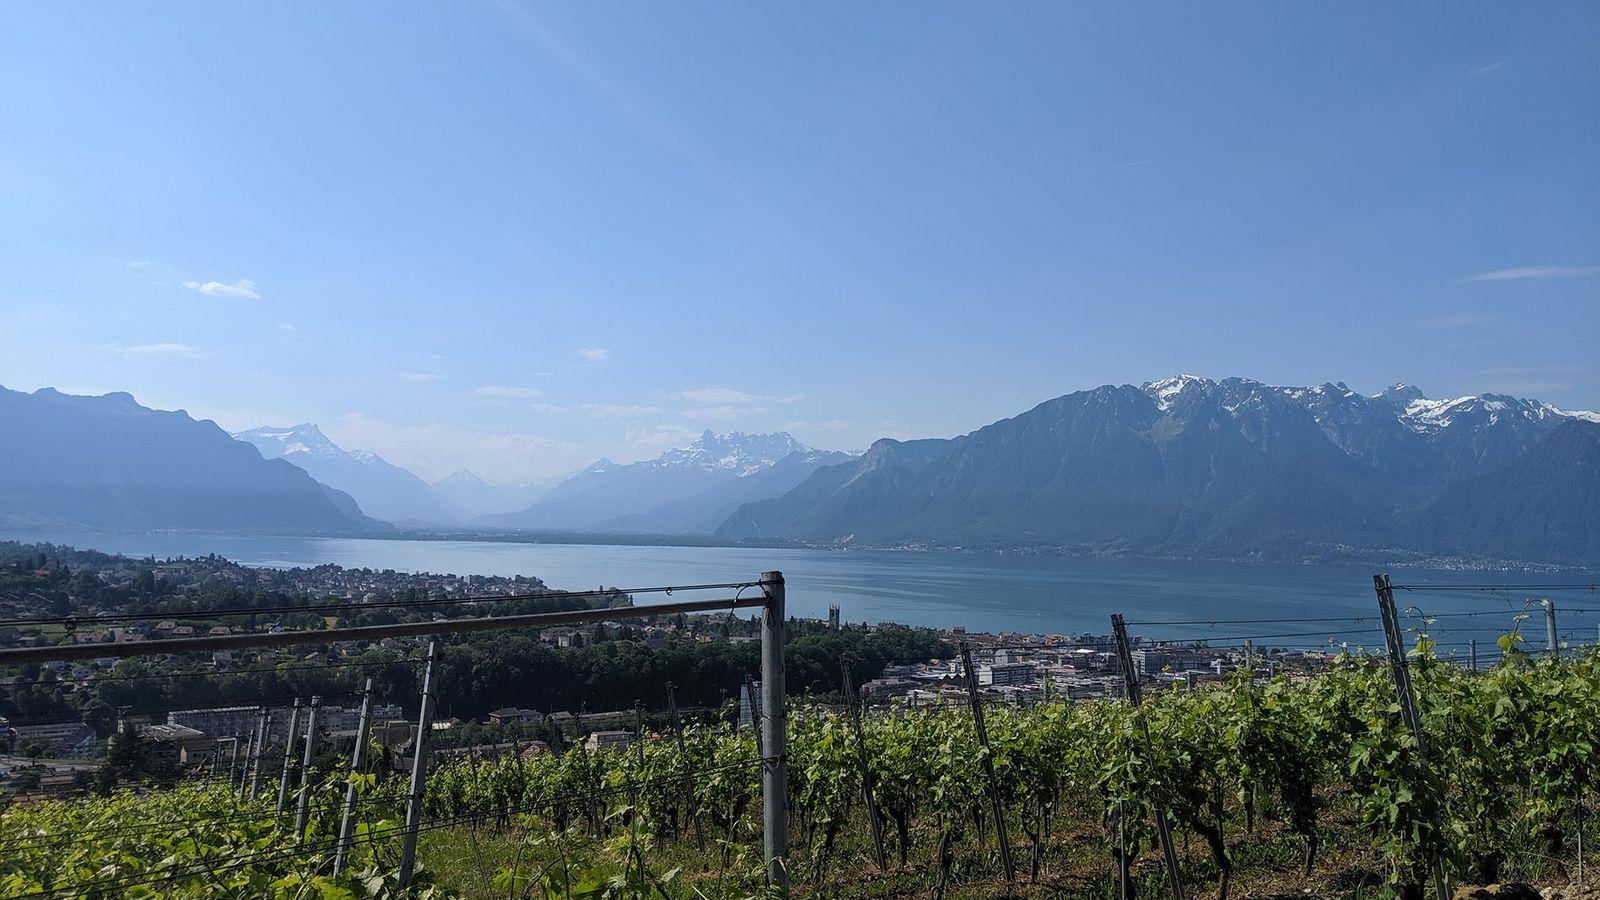 Vineyards in Lavaux, Lake Geneva